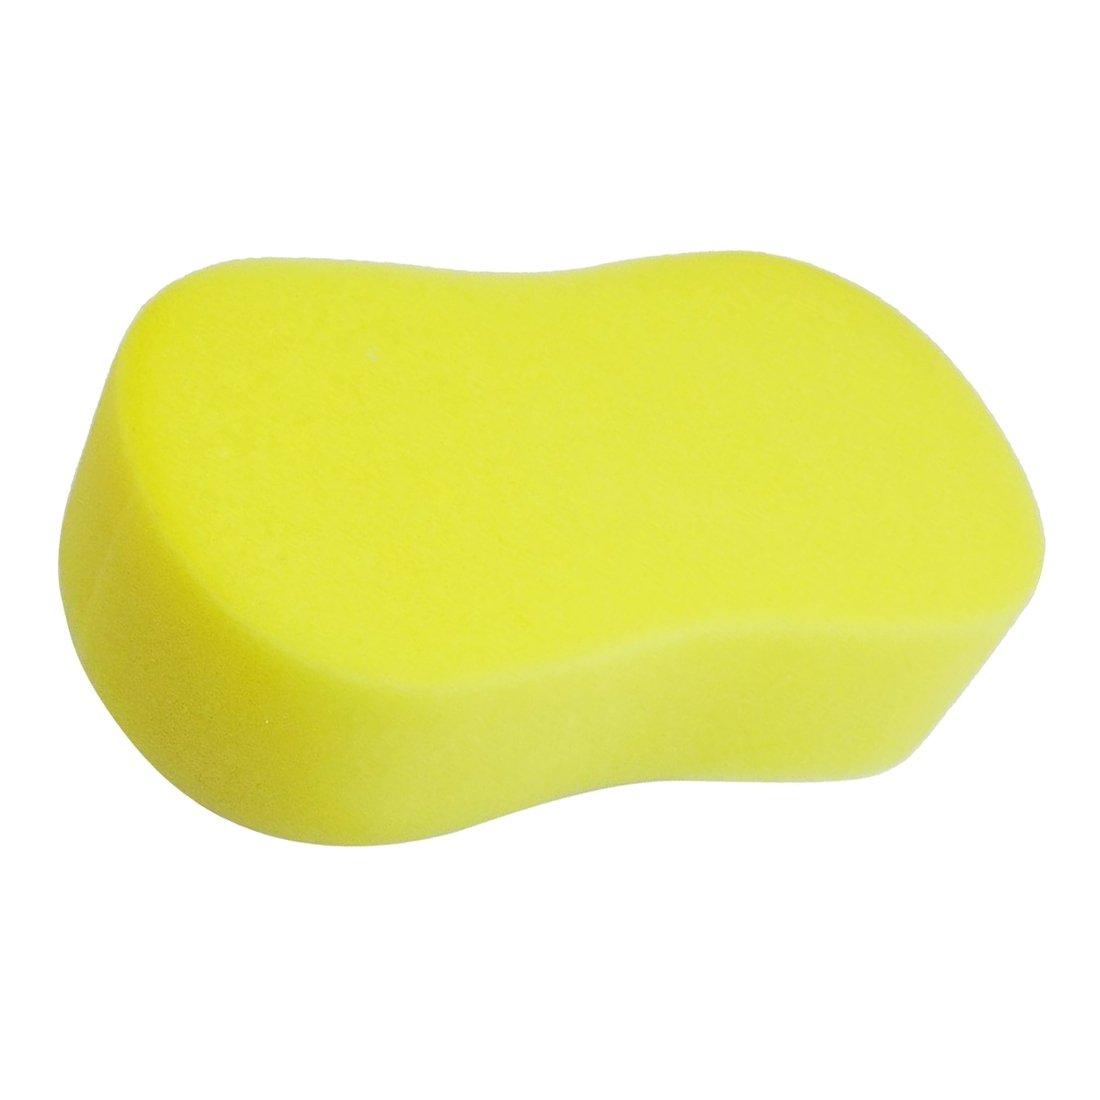 Moligh doll Yellow Soft Sponge Car Wagon Washing Cleaning Glass Seat Cushion 23g